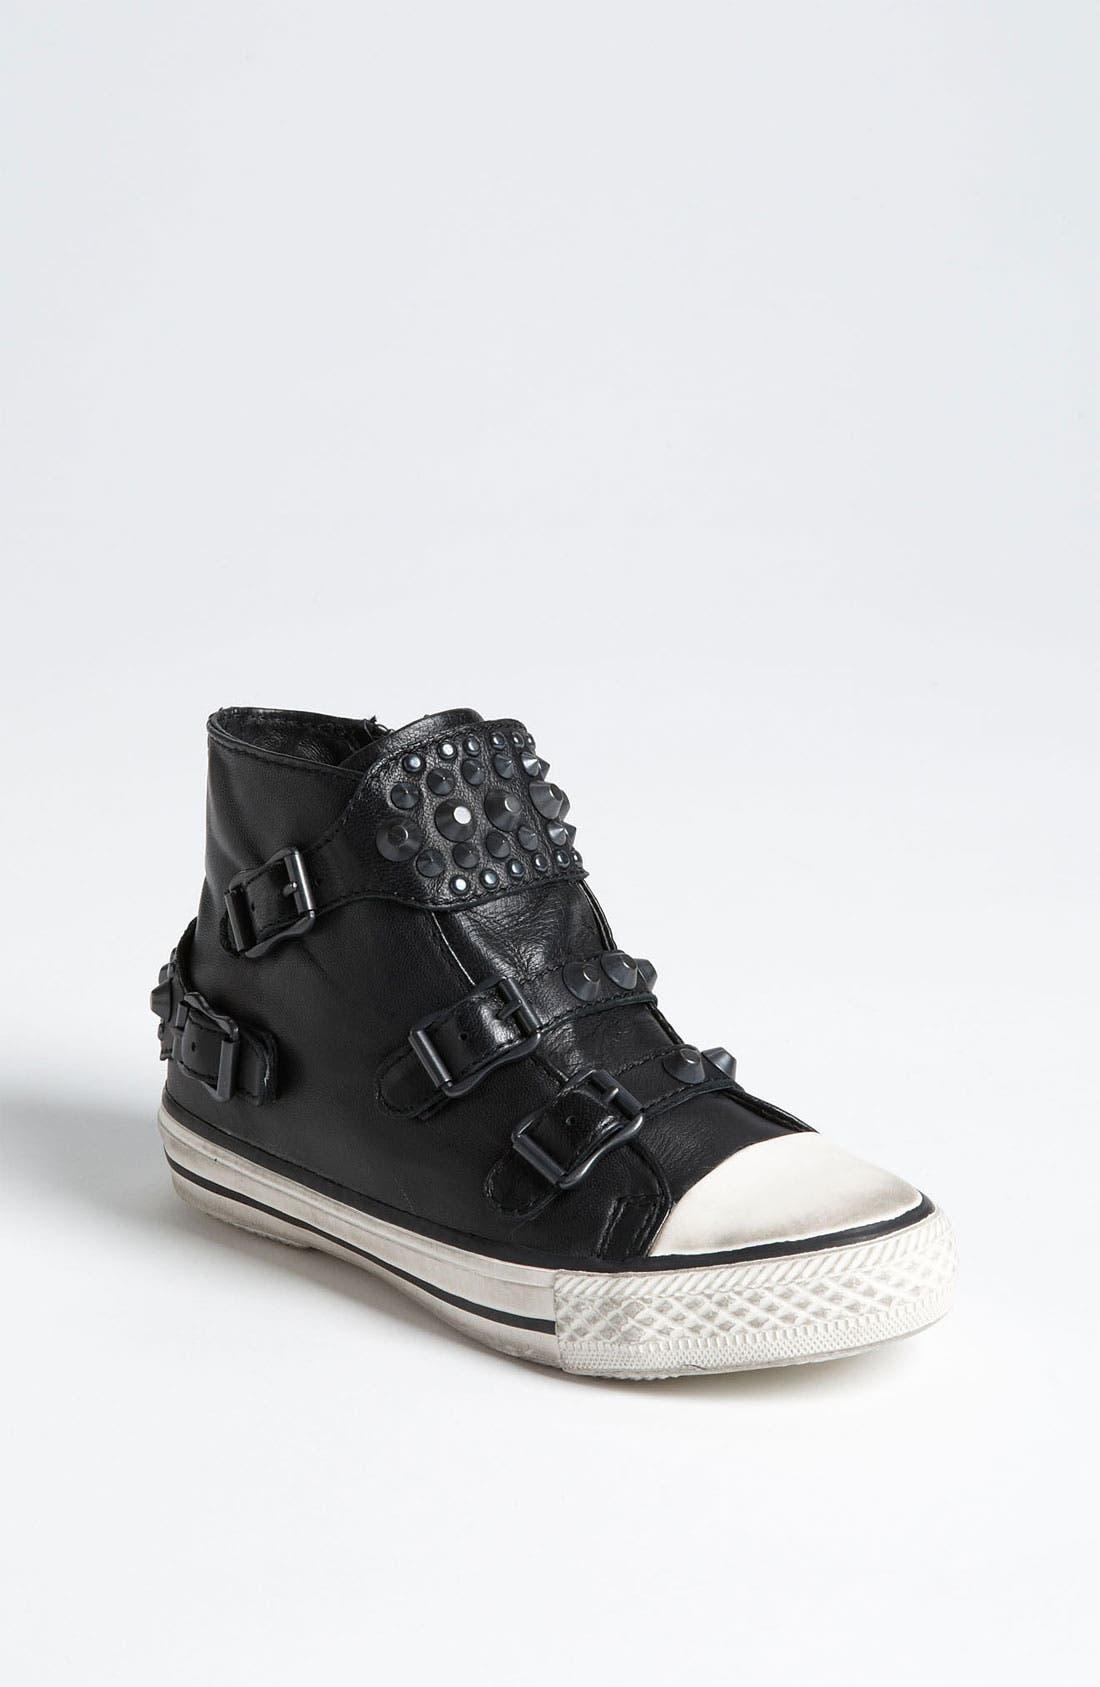 Main Image - Ash 'Frog' Sneaker (Toddler, Little Kid & Big Kid)